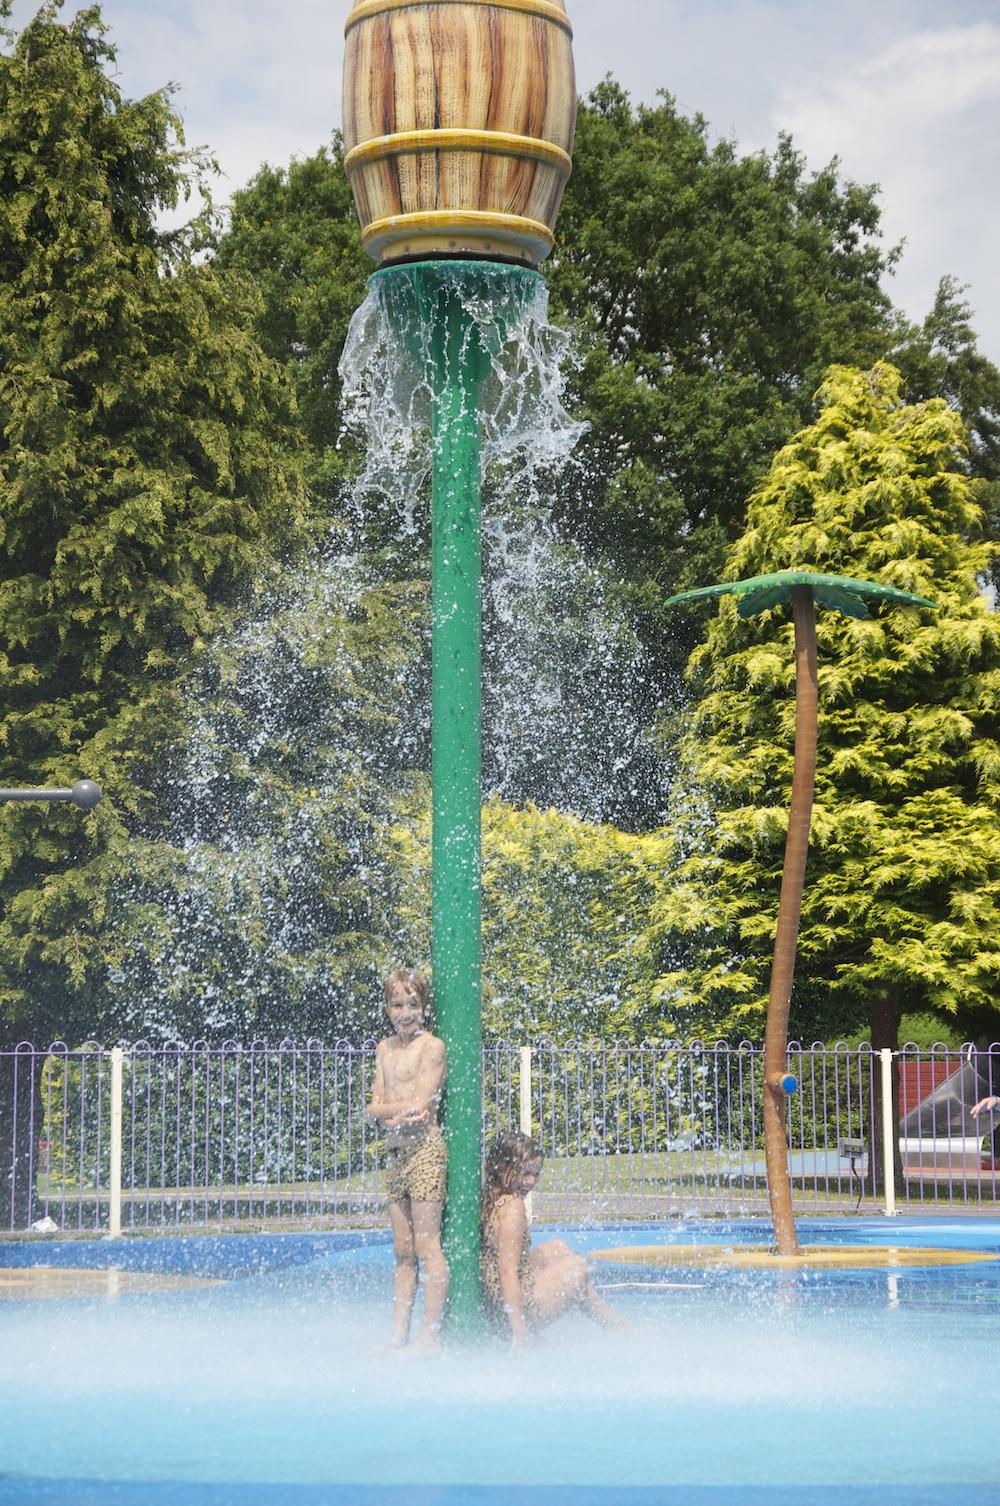 Paultons_splash_park_